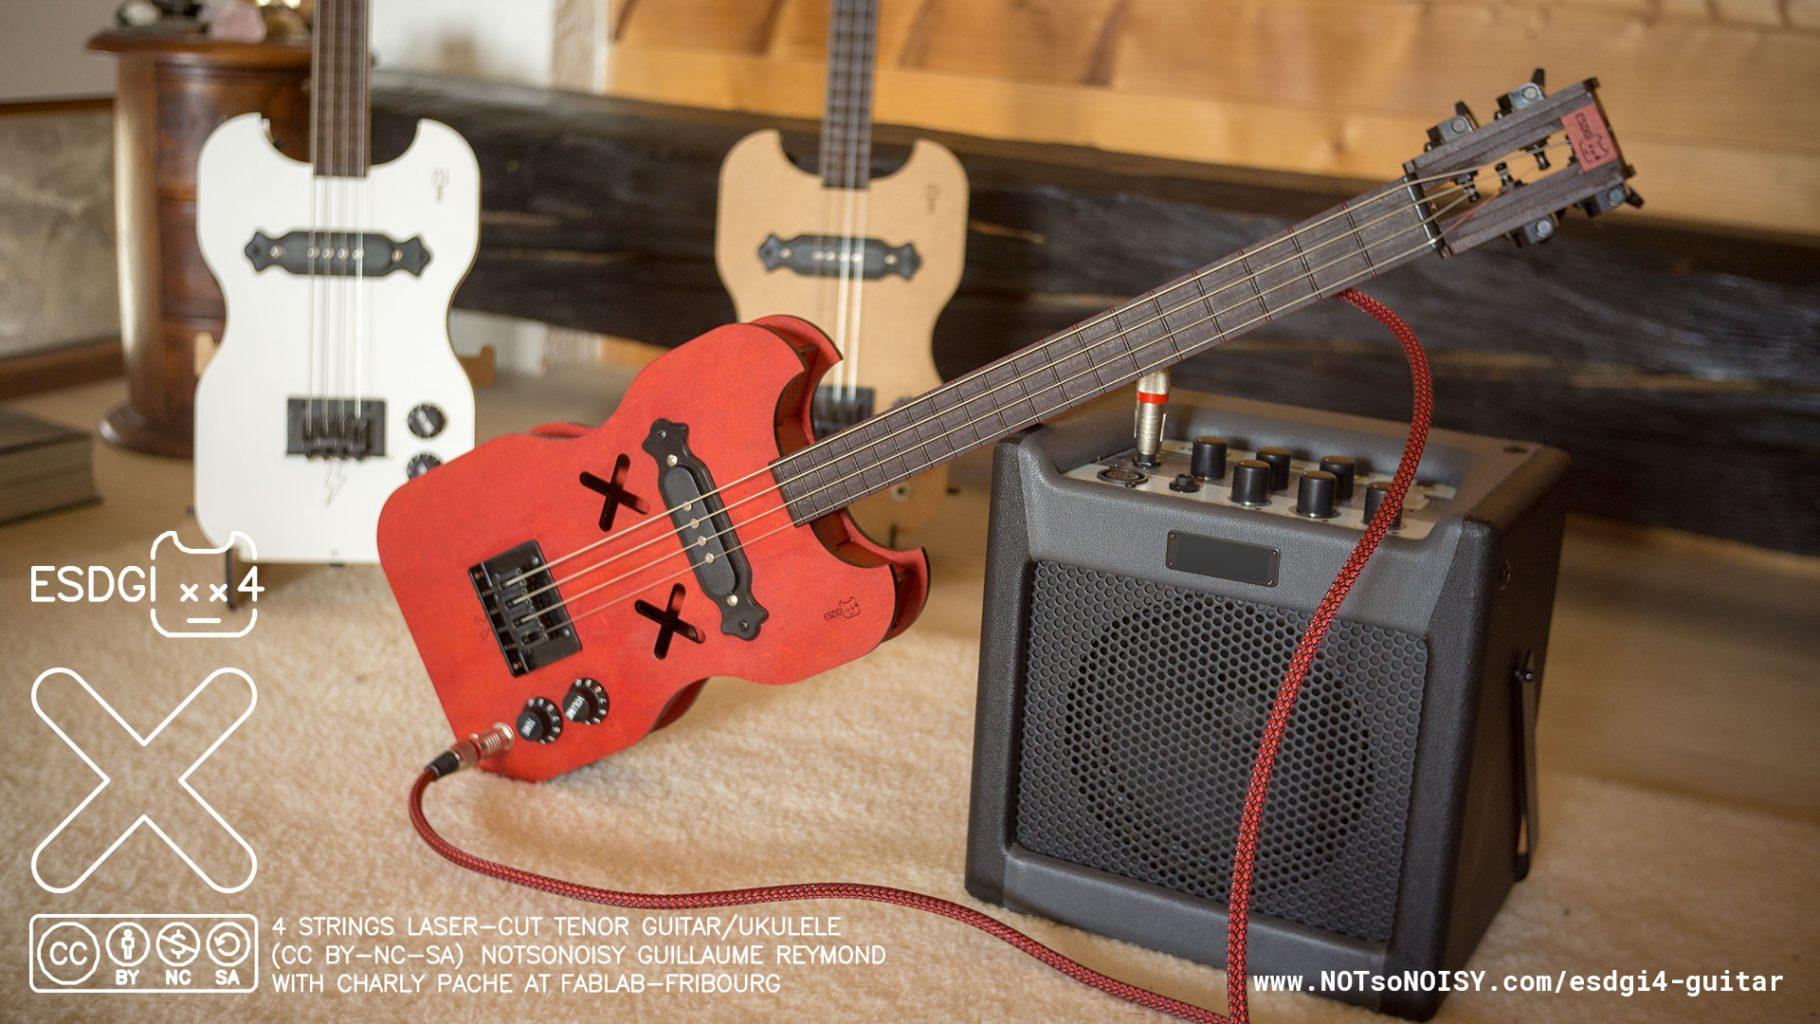 Esdgi4 tenor guitar/ukulele (laser cut DIY kit)